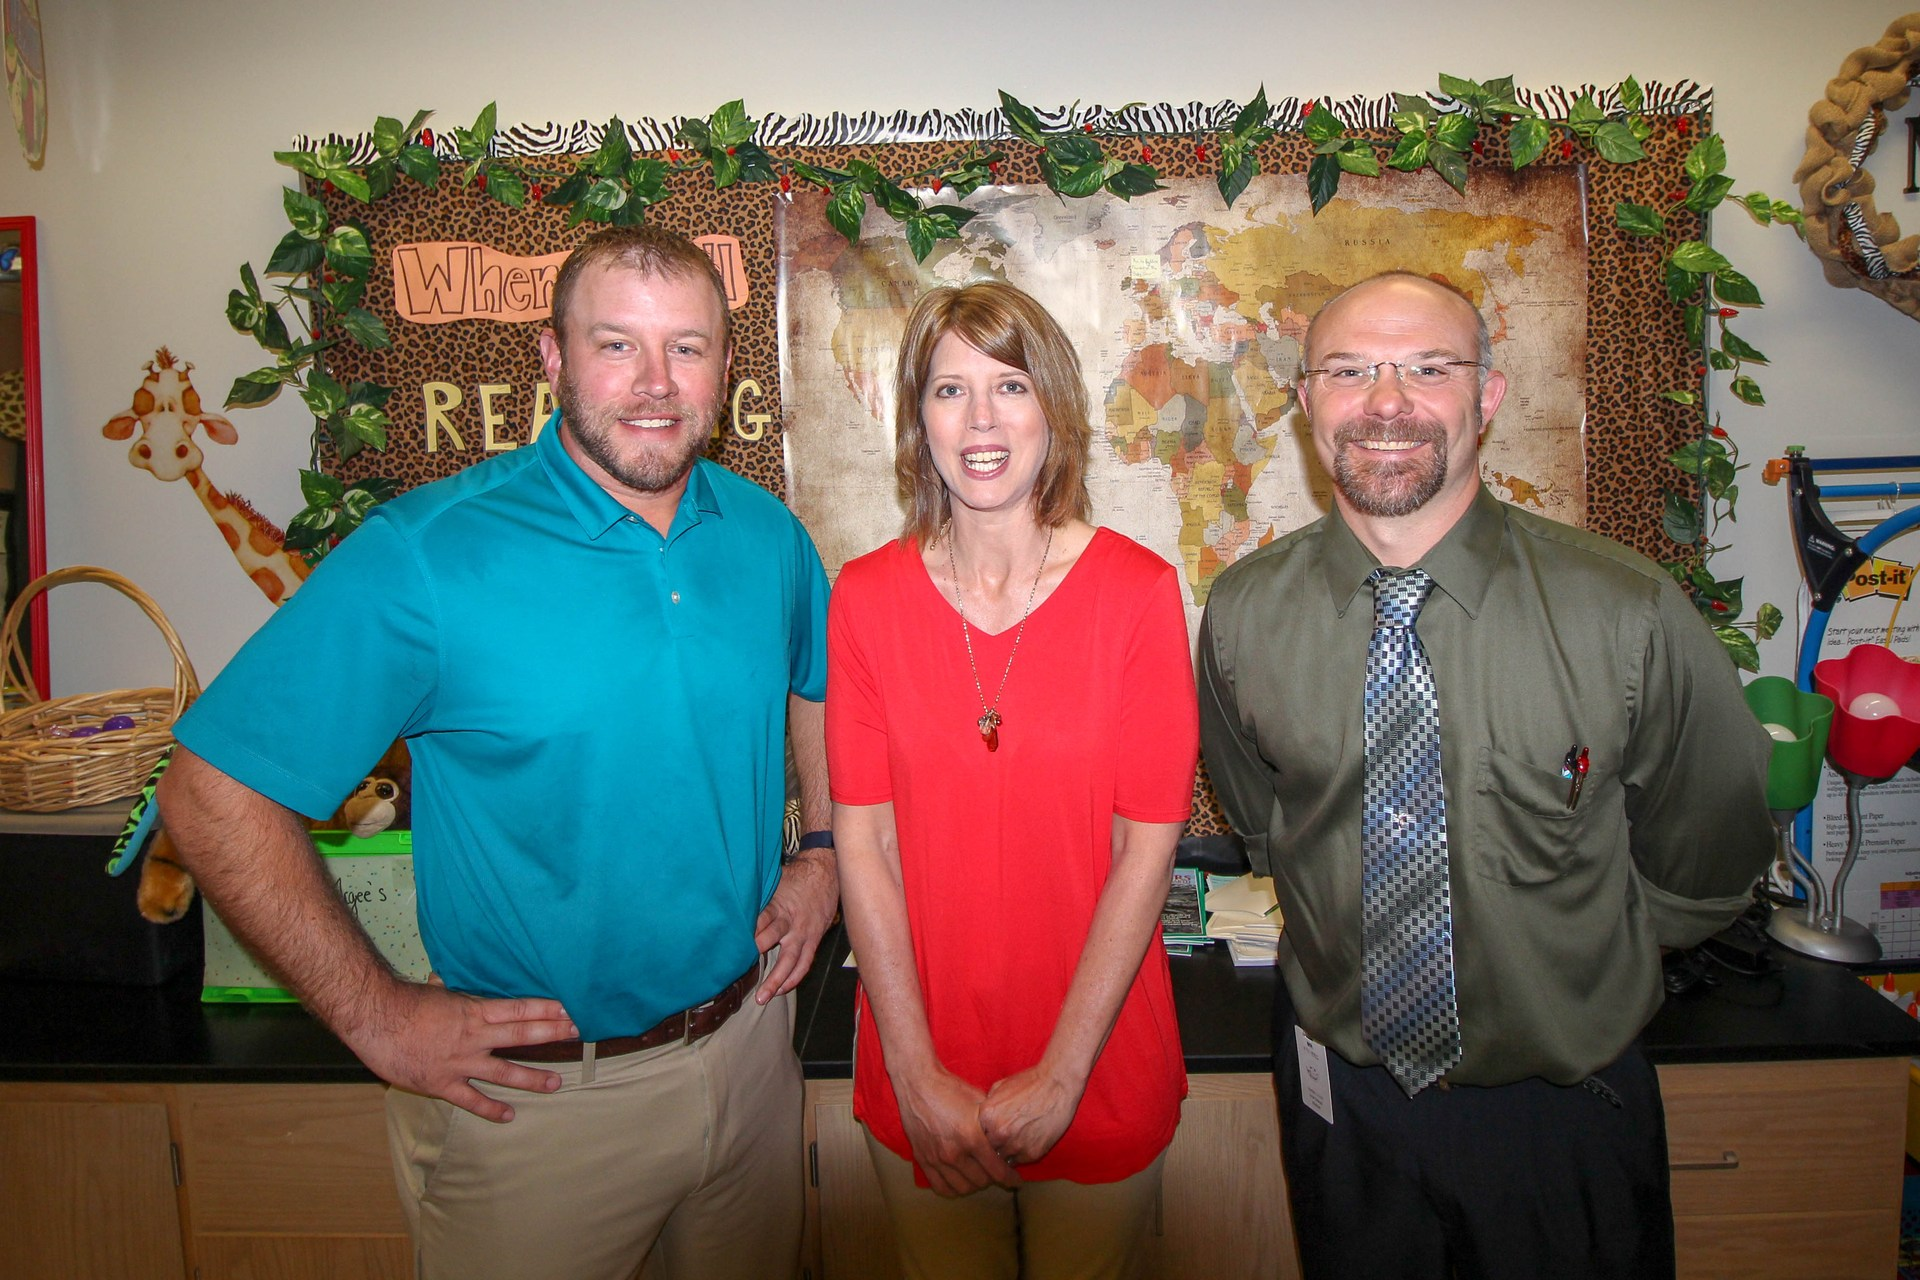 Mr. Sitosky, Mrs. McGee, Mr. Falisec